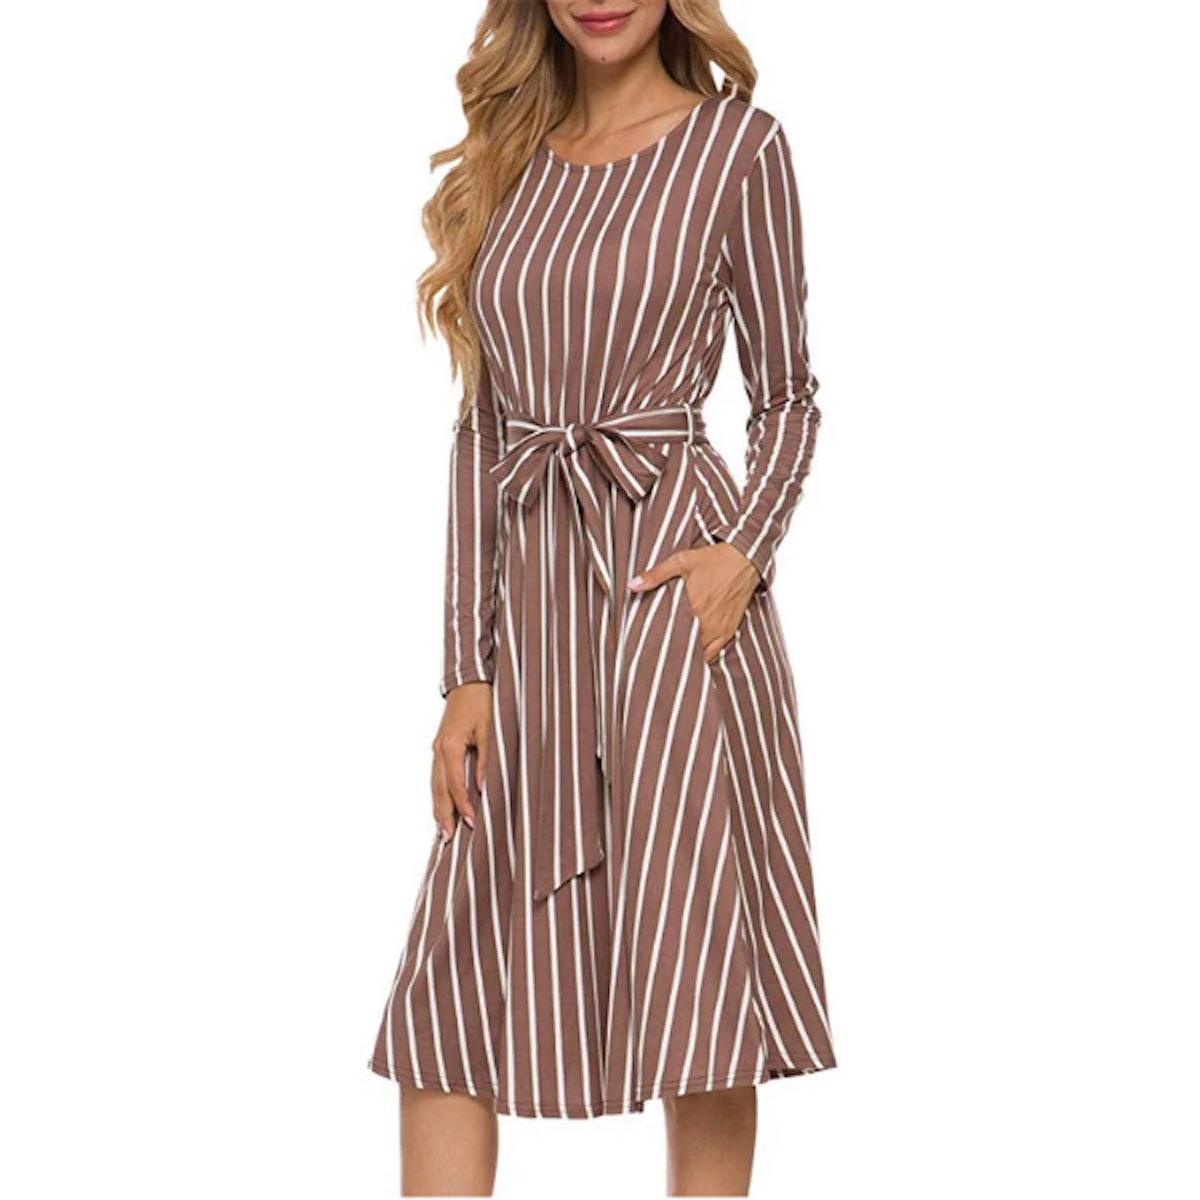 levaca Flowy Striped Long Sleeve Midi Dress with Belt & Pockets